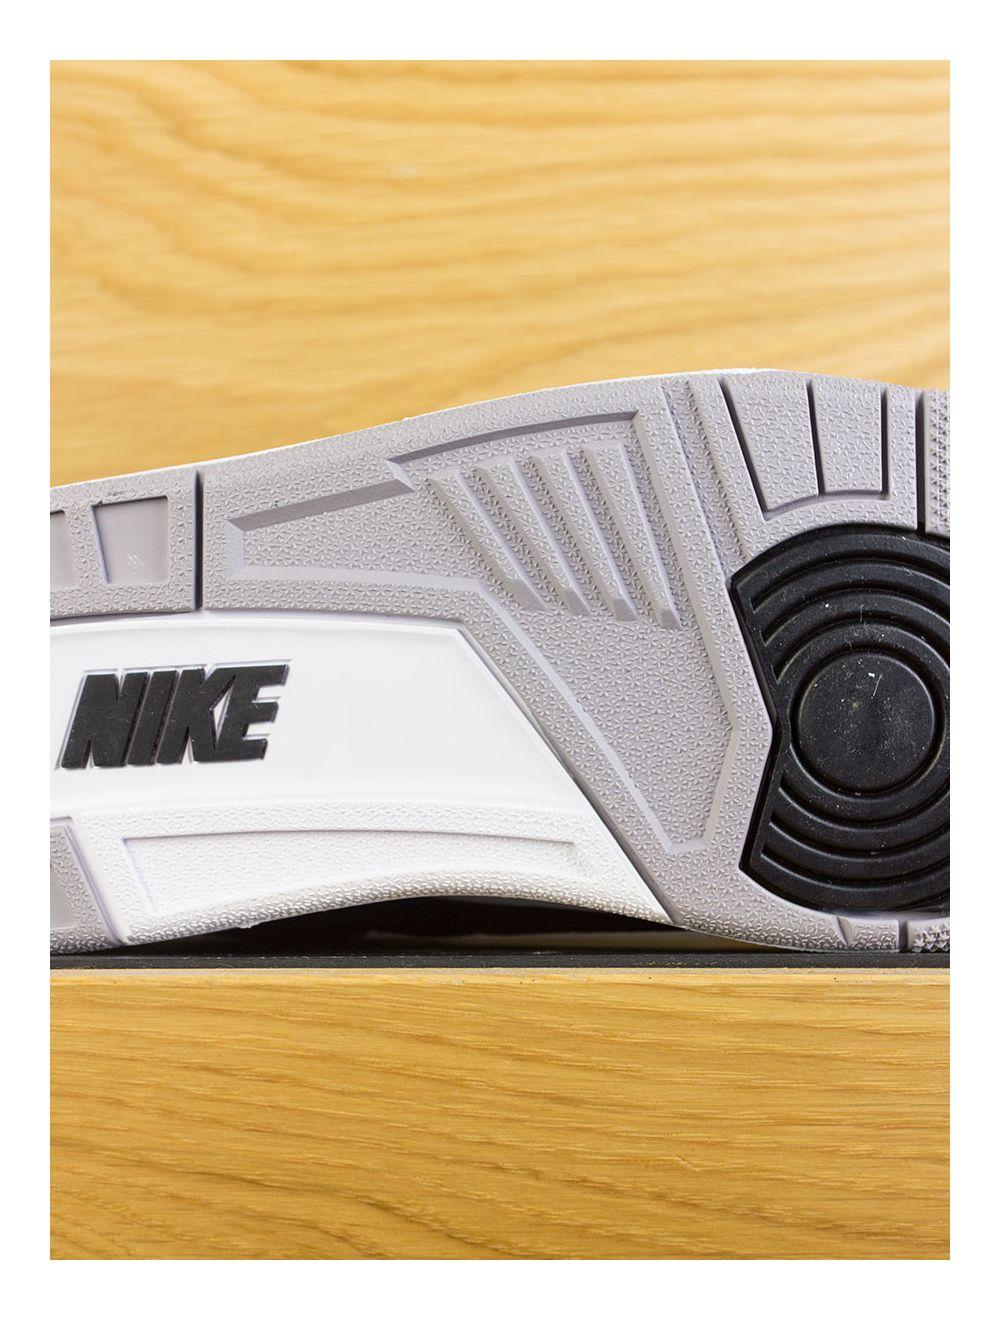 new style ac304 ee402 Nike Air Jordan Retro 3 Tinker Hatfield - Black Cement Grey